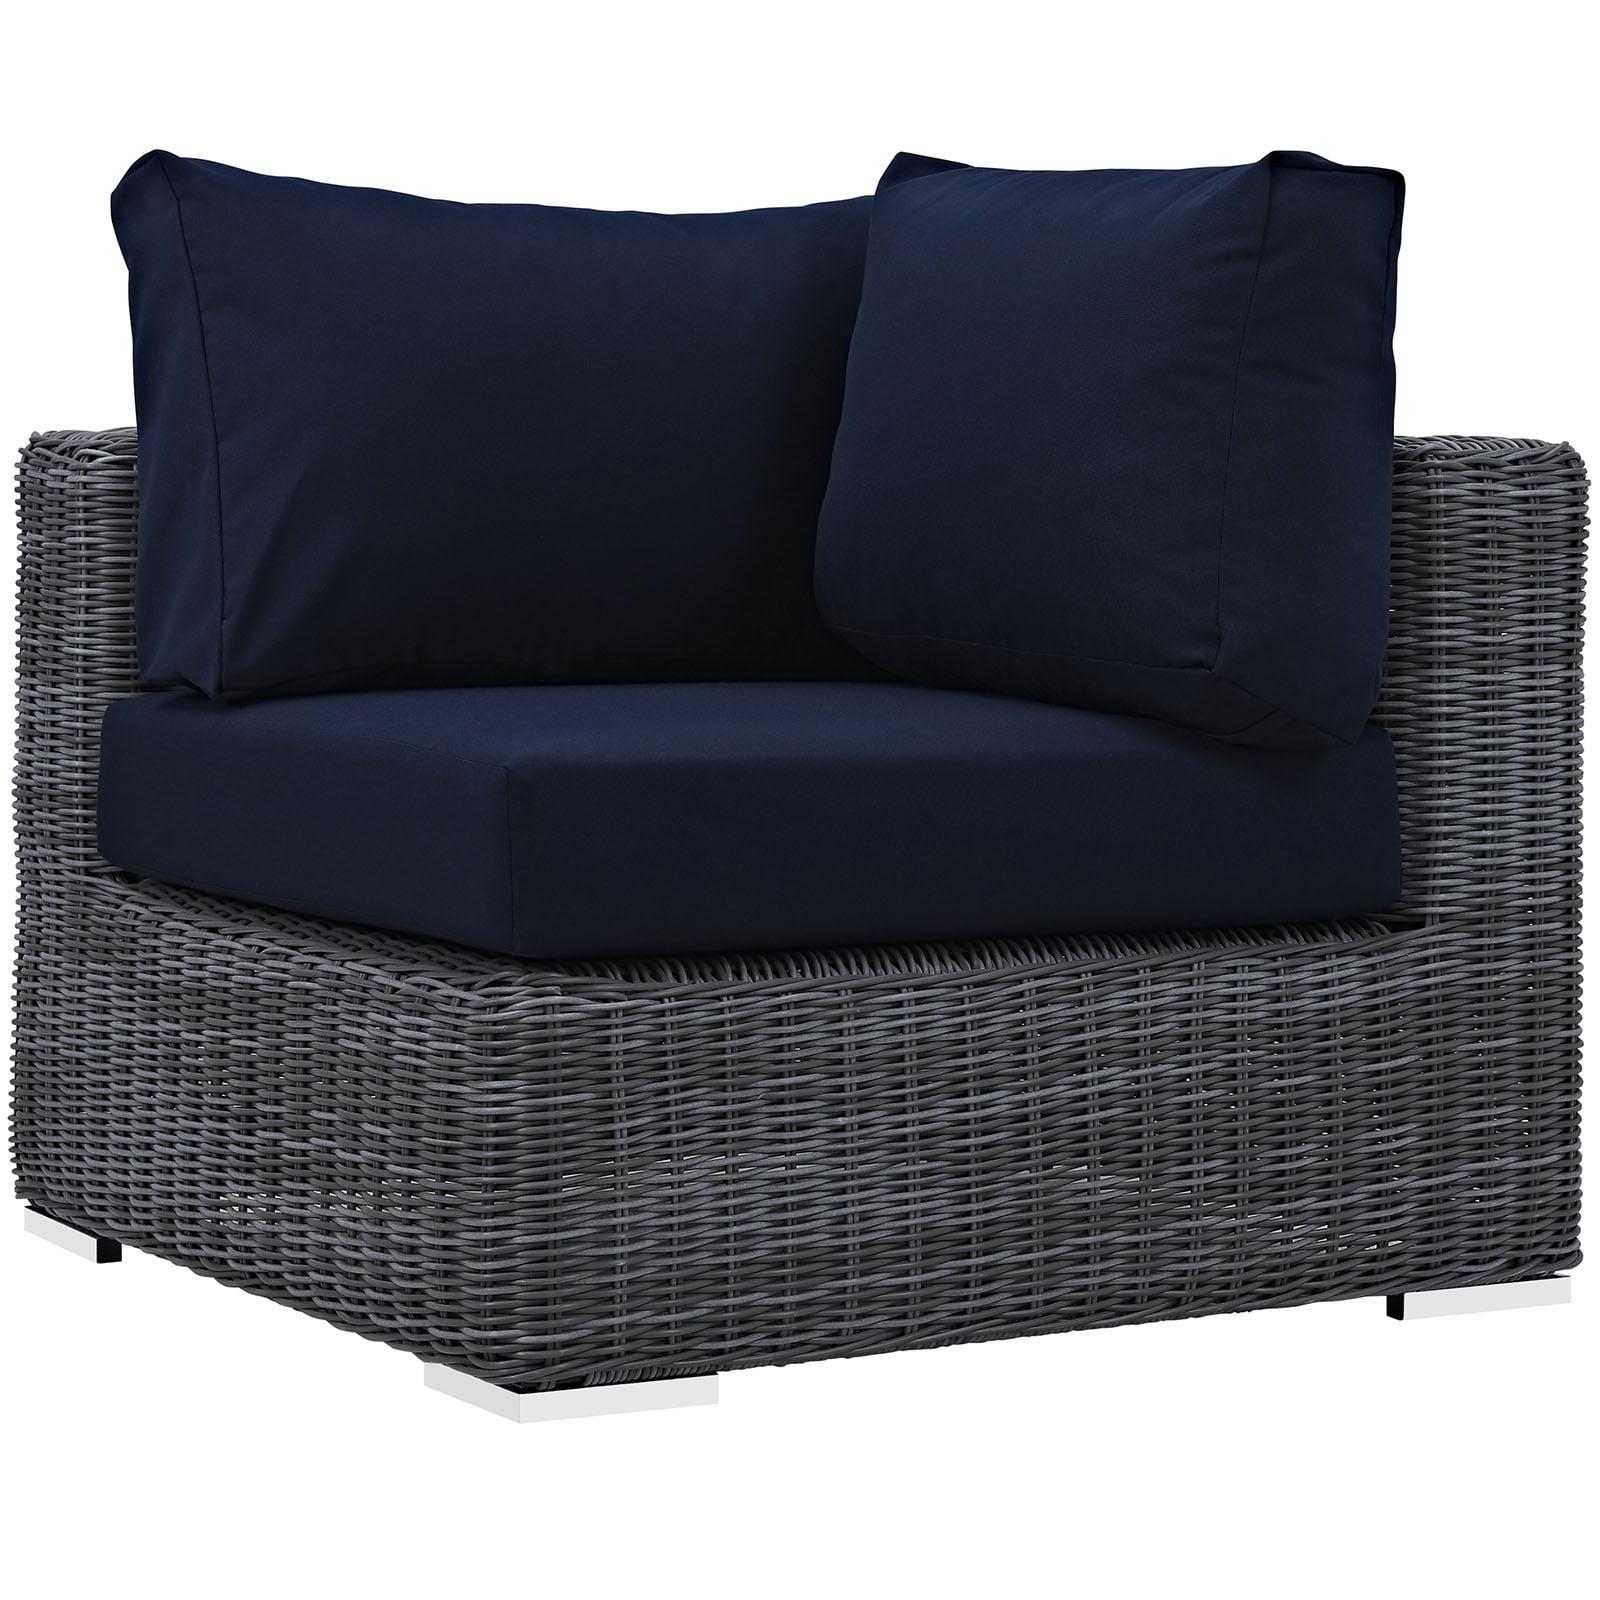 Modern Contemporary Urban Design Outdoor Patio Balcony Corner Lounge Chair, Navy Blue, Rattan